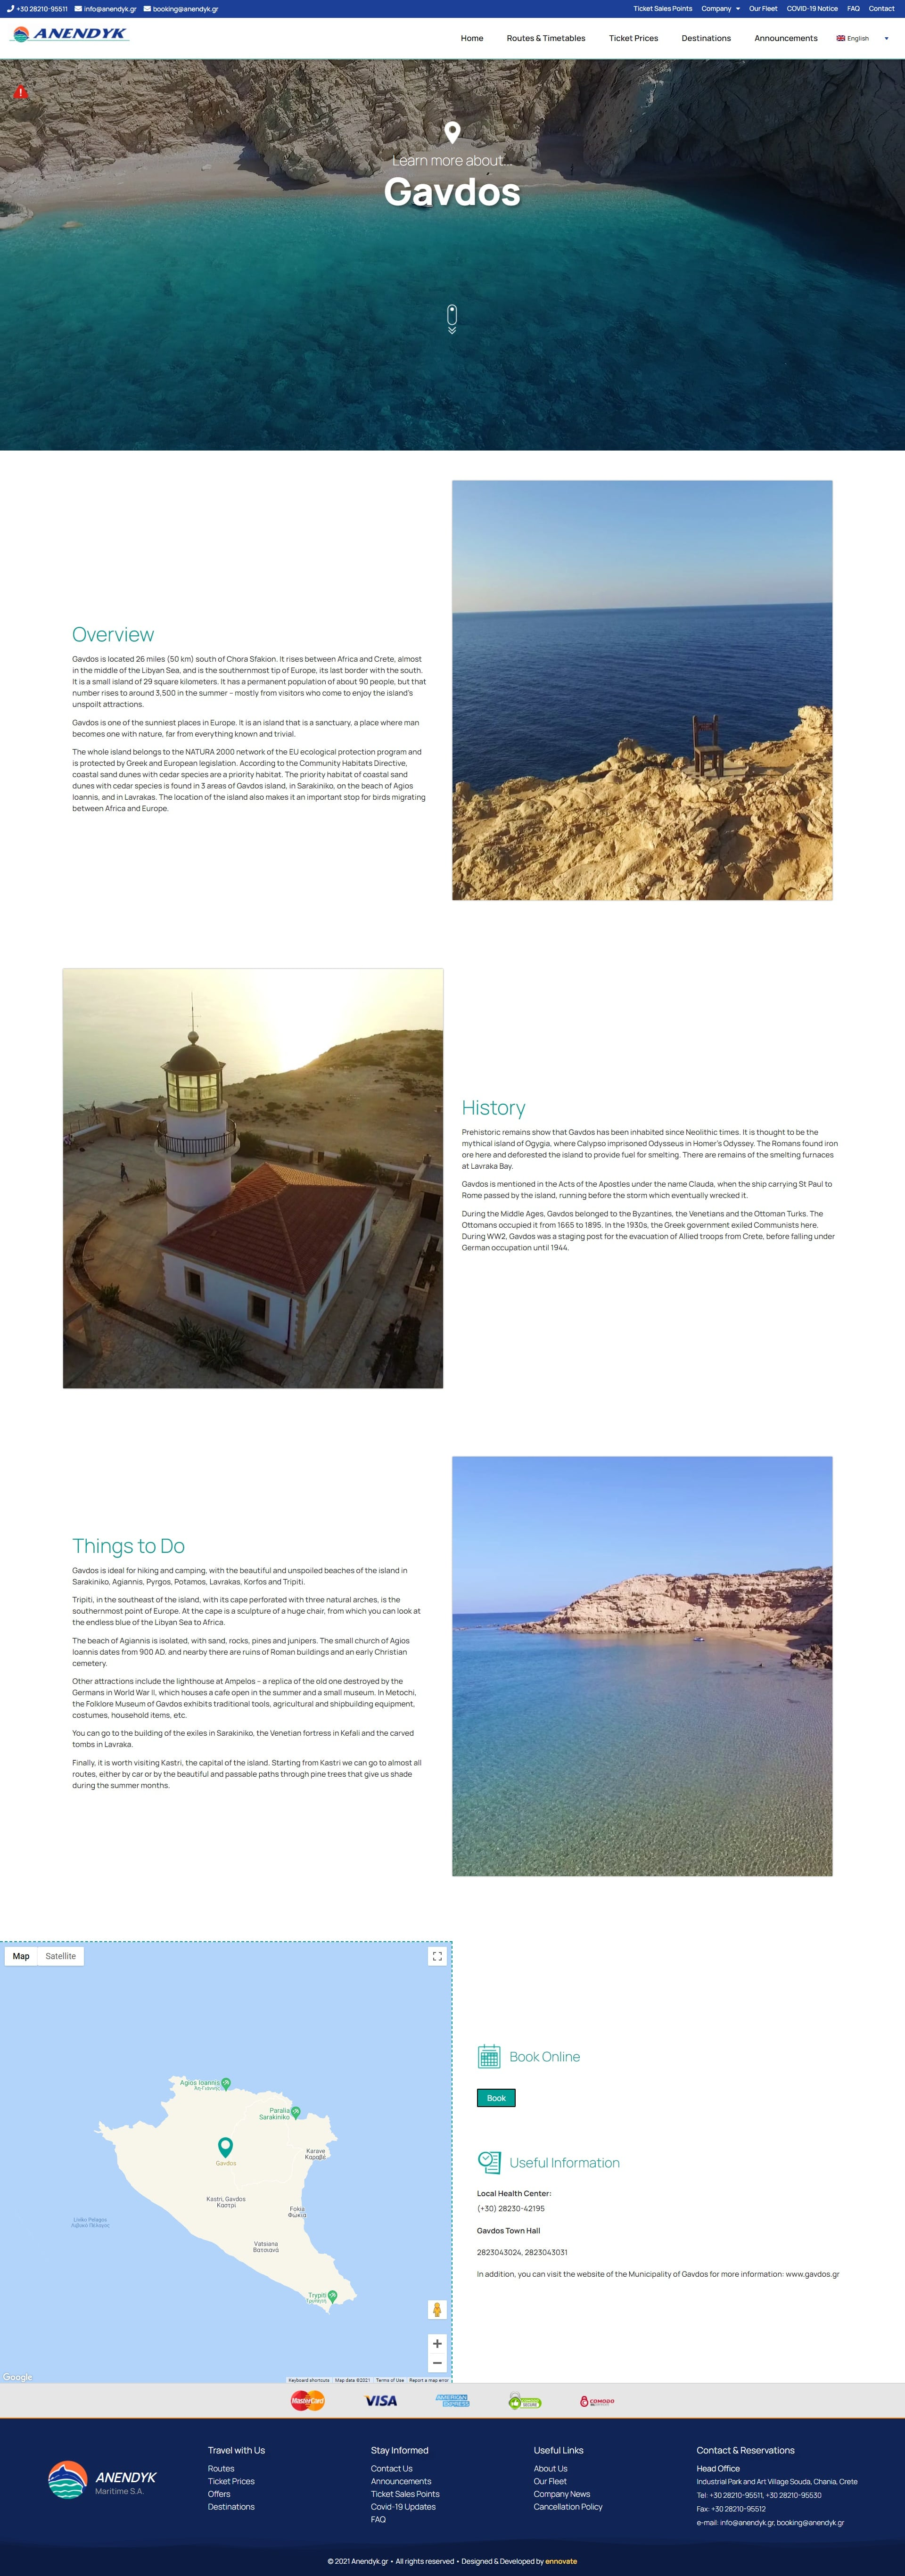 ANENDYK - DESTINATIONS - GAVDOS PAGE